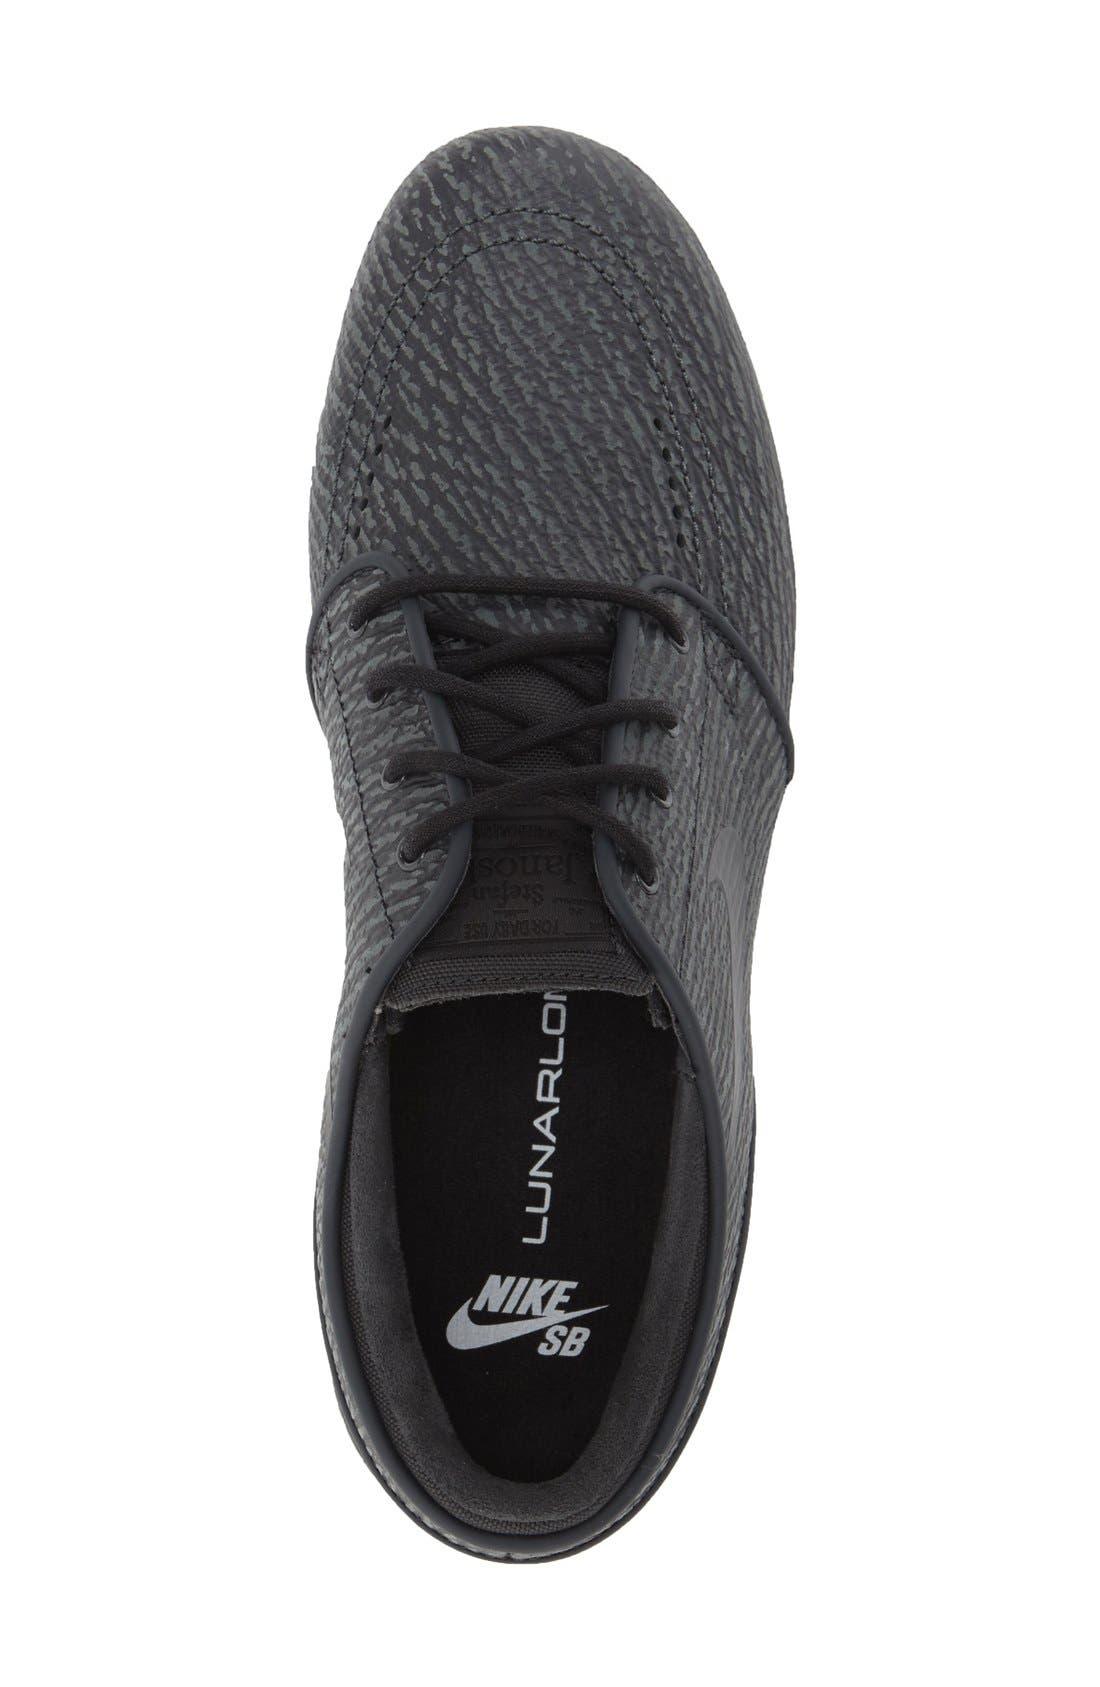 Alternate Image 3  - Nike 'Lunar - Stefan Janoski SB' Skate Shoe (Men)